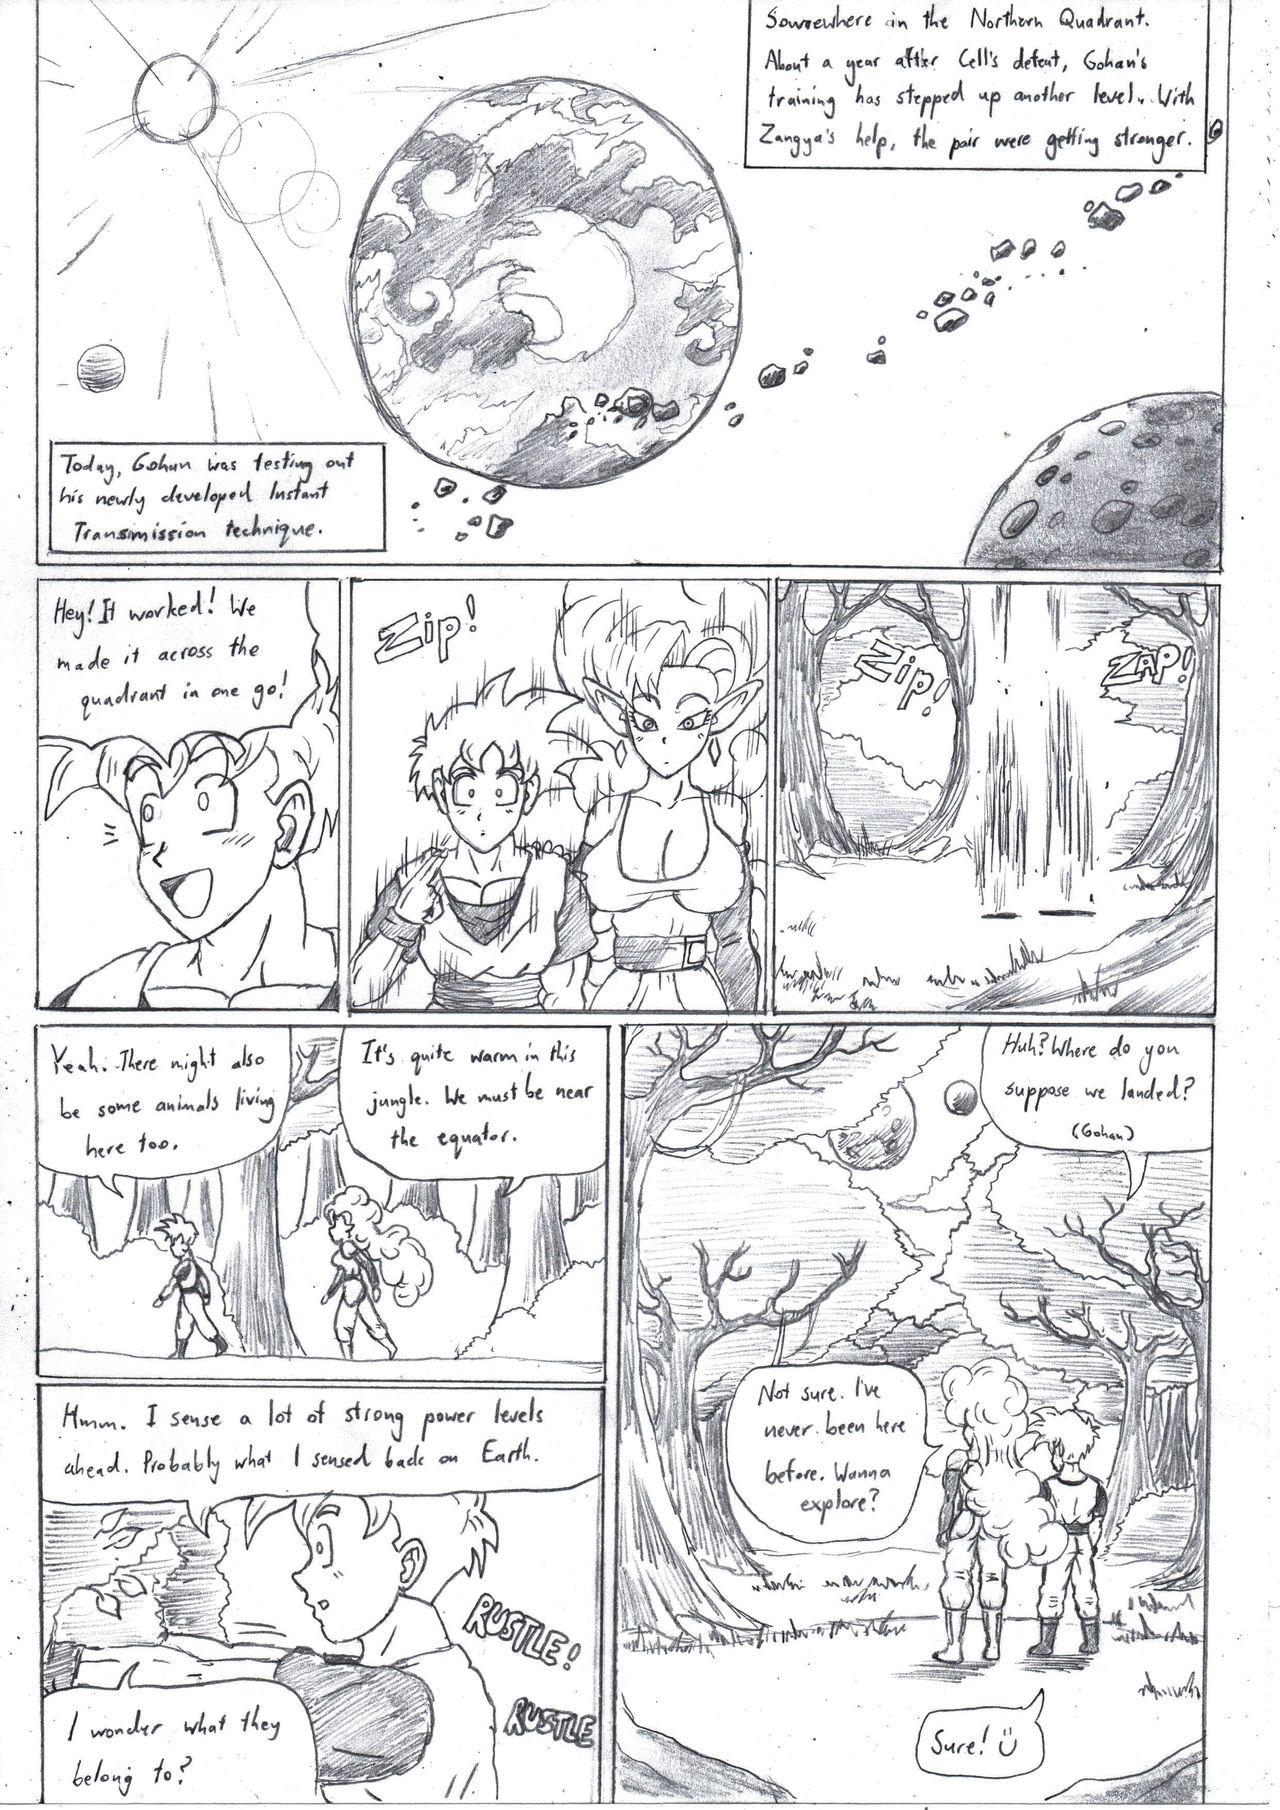 Journey To Saiya Thewritefiction 08